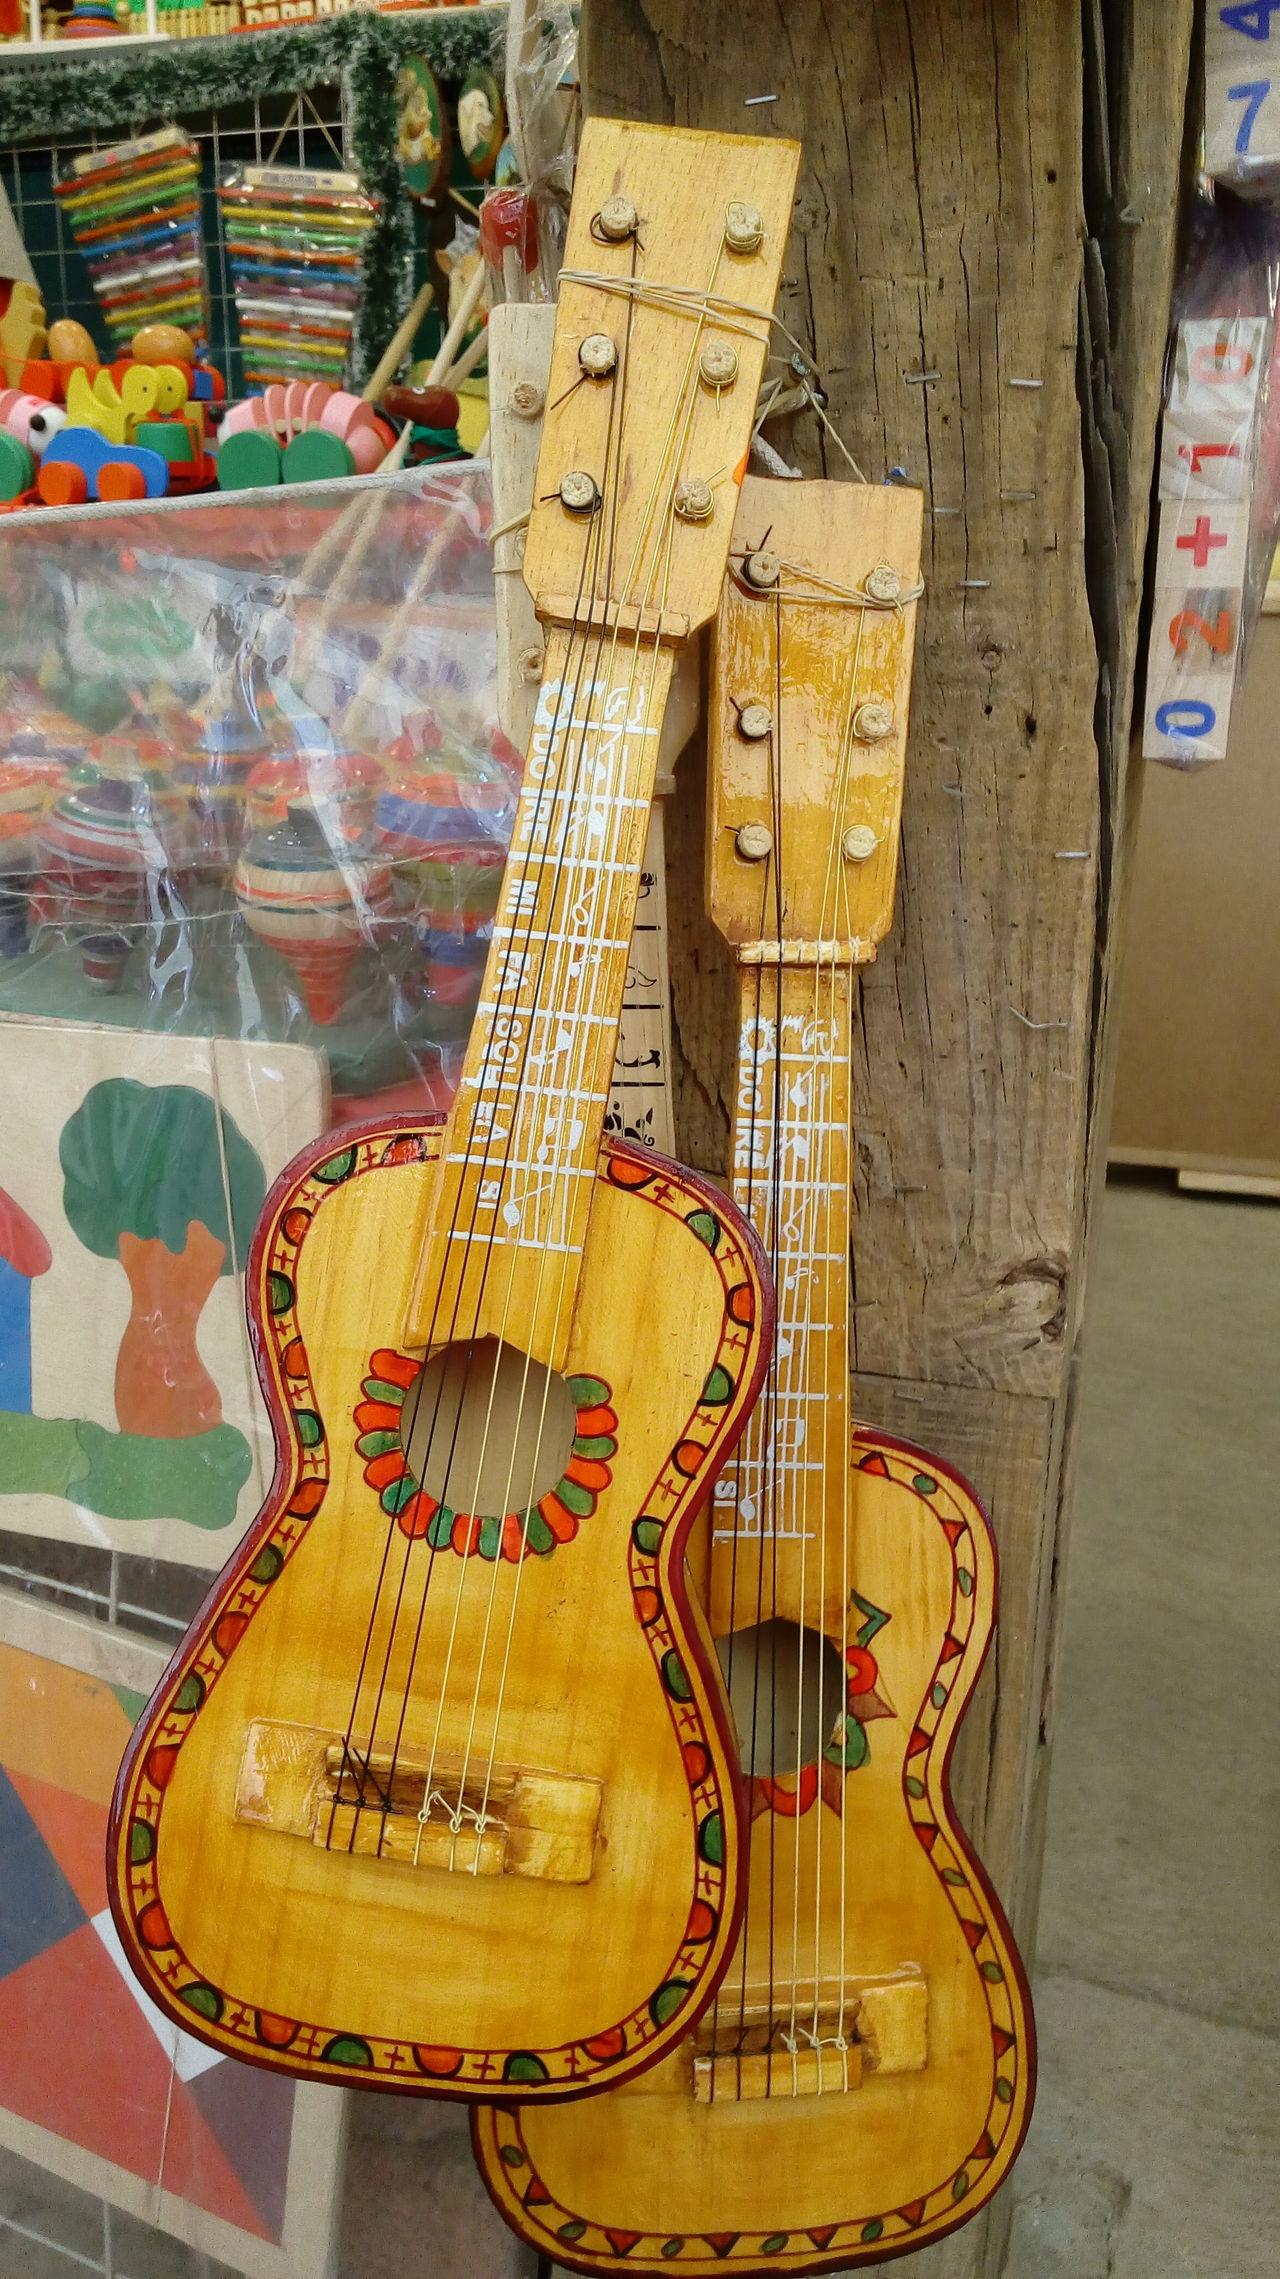 Guitarra. Guitarra First Eyeem Photo Guitarrita Woodtoys Musical Instrument